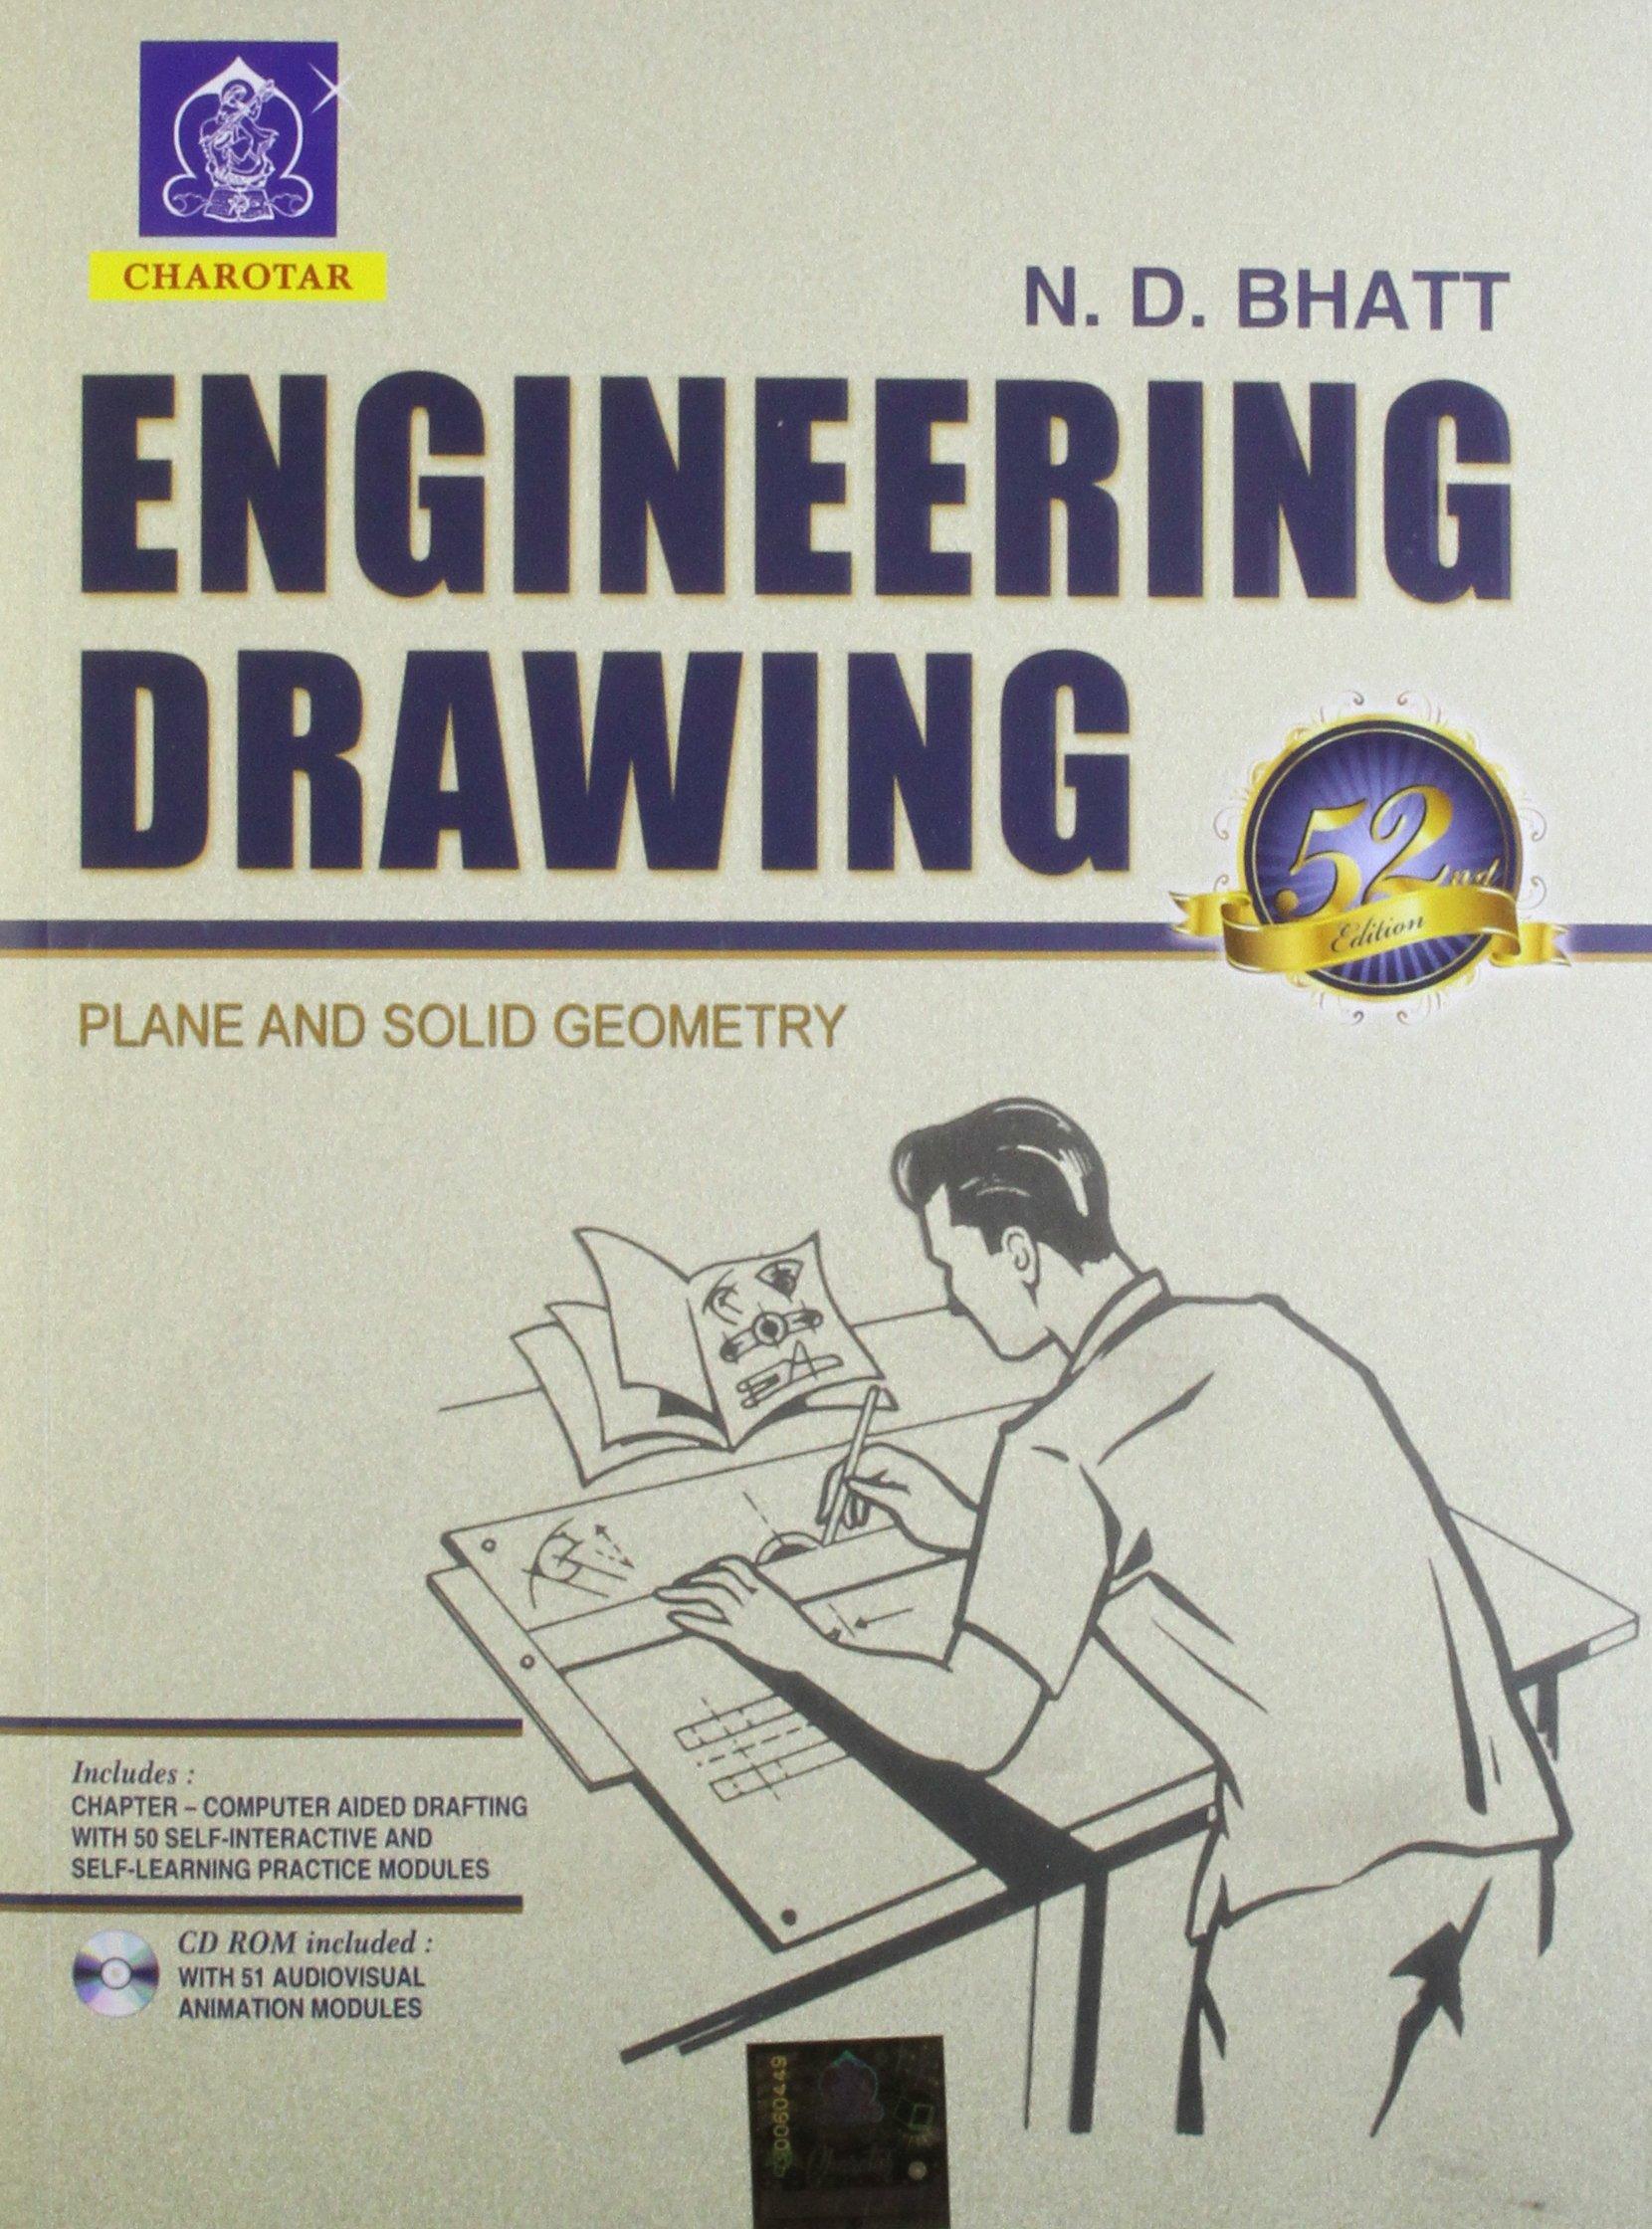 machine drawing by kr gopalakrishna pdf download - JS Photography